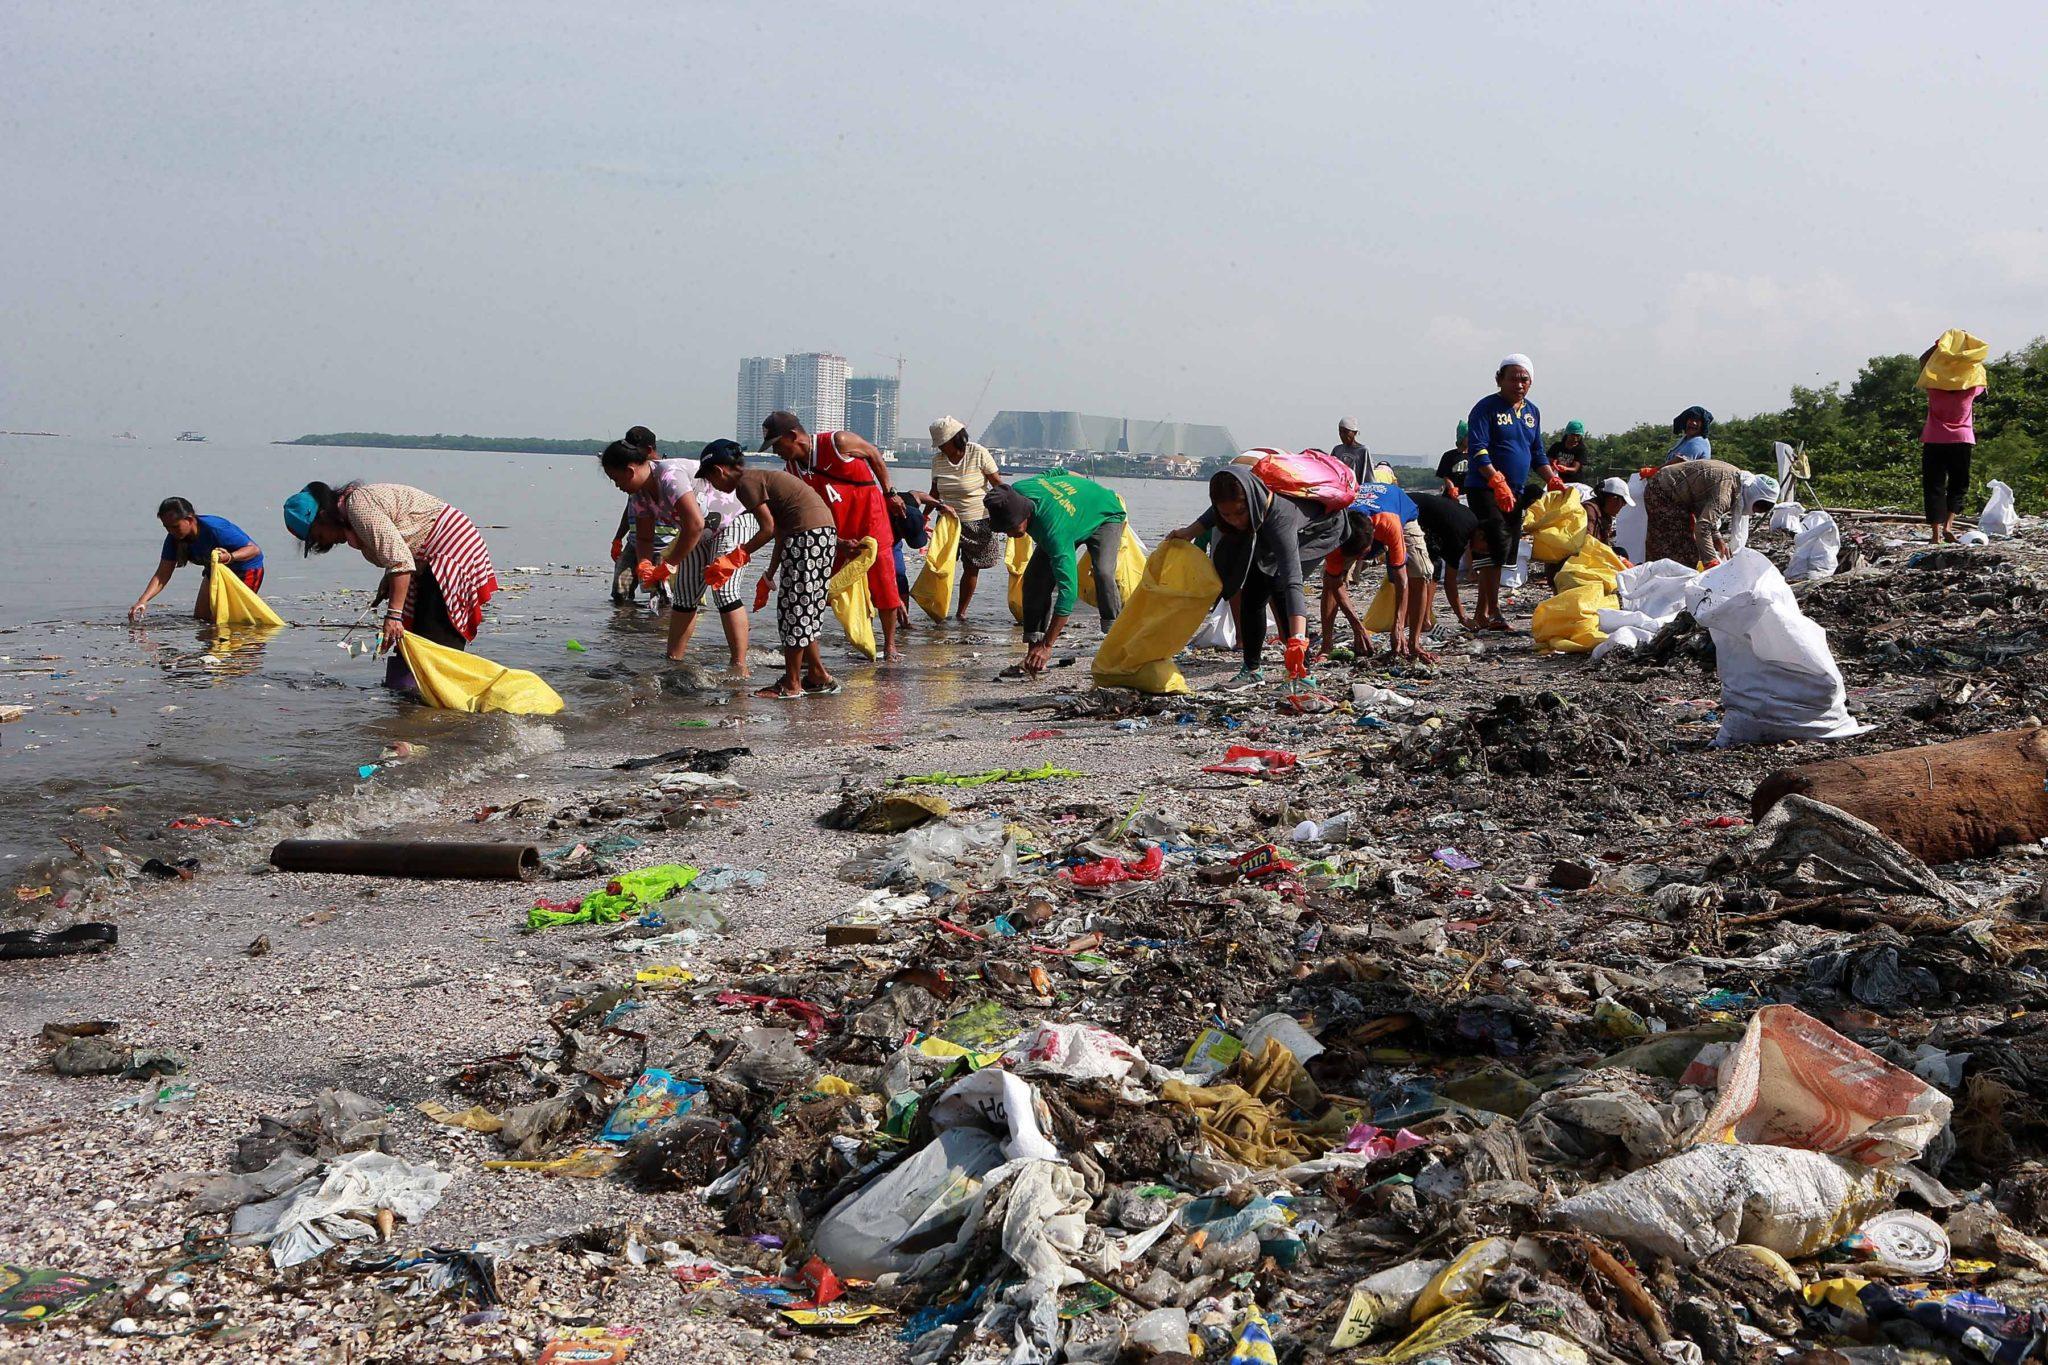 Plastic pollution